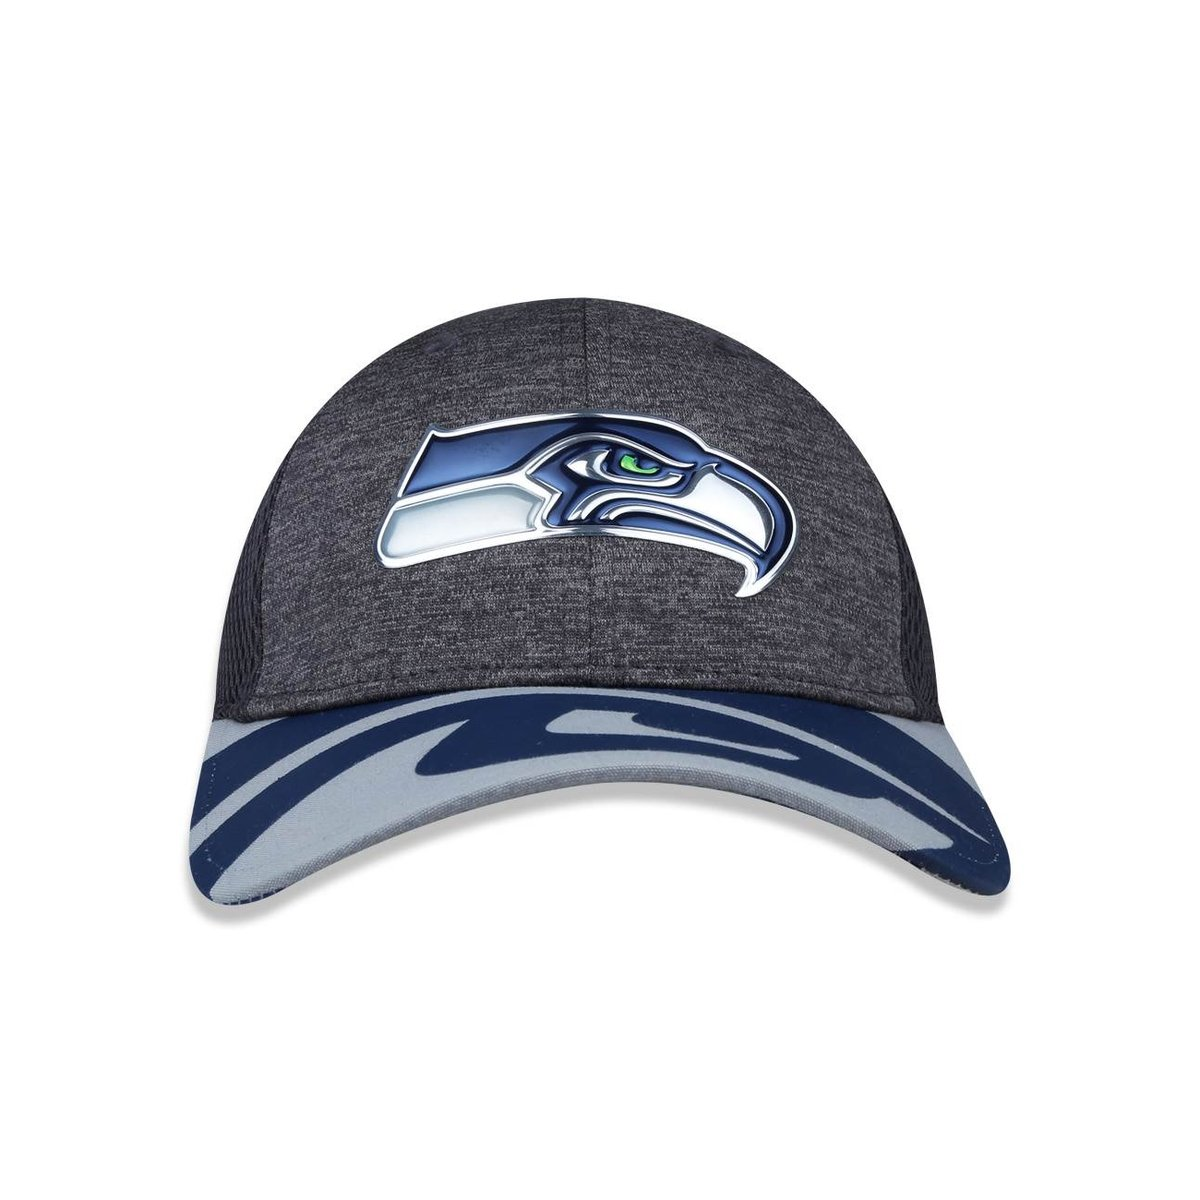 d15291b784 Boné 3930 Seattle Seahawks NFL Aba Curva New Era - Cinza - Compre ...